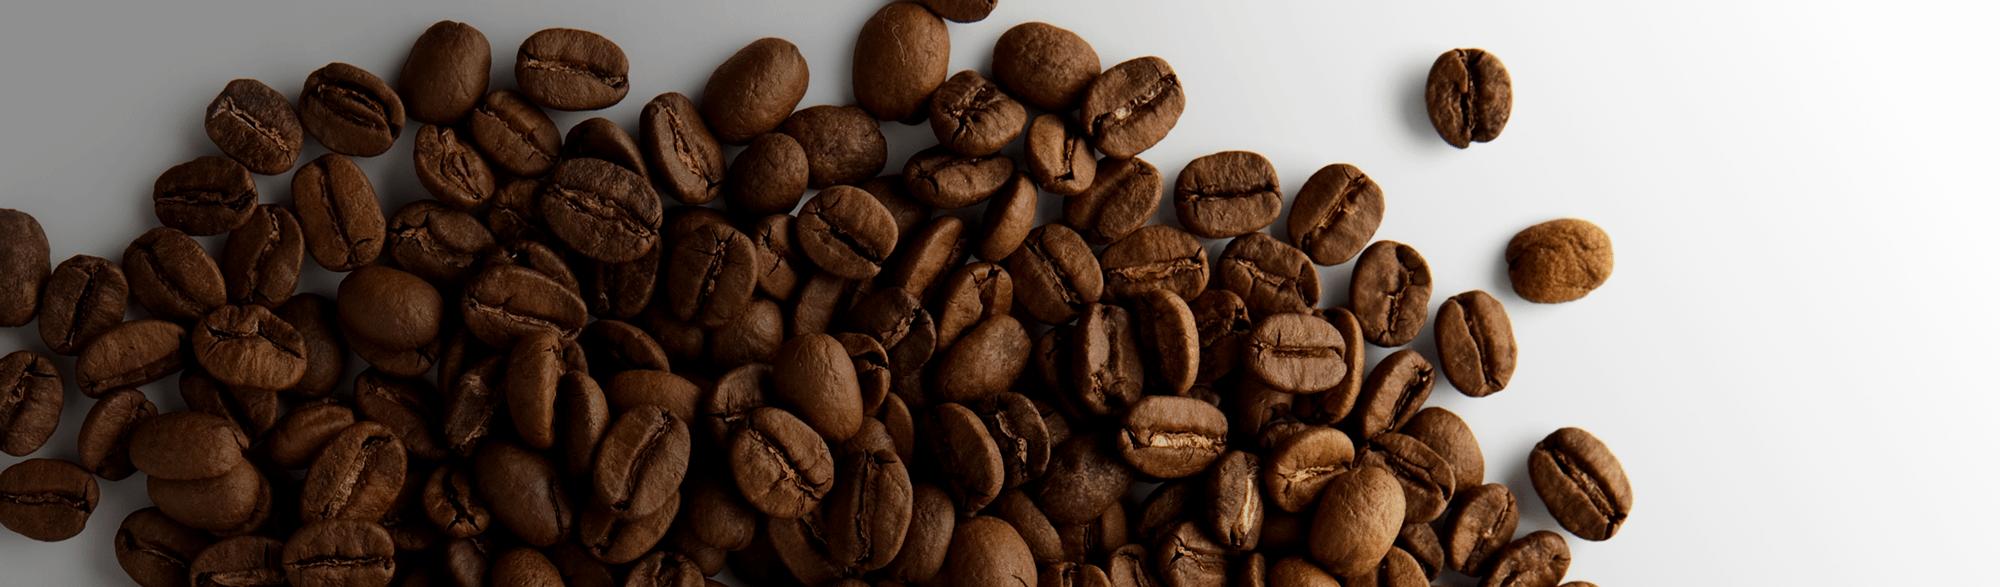 iStock 160813469 2000 2 - Lej Kaffemaskine